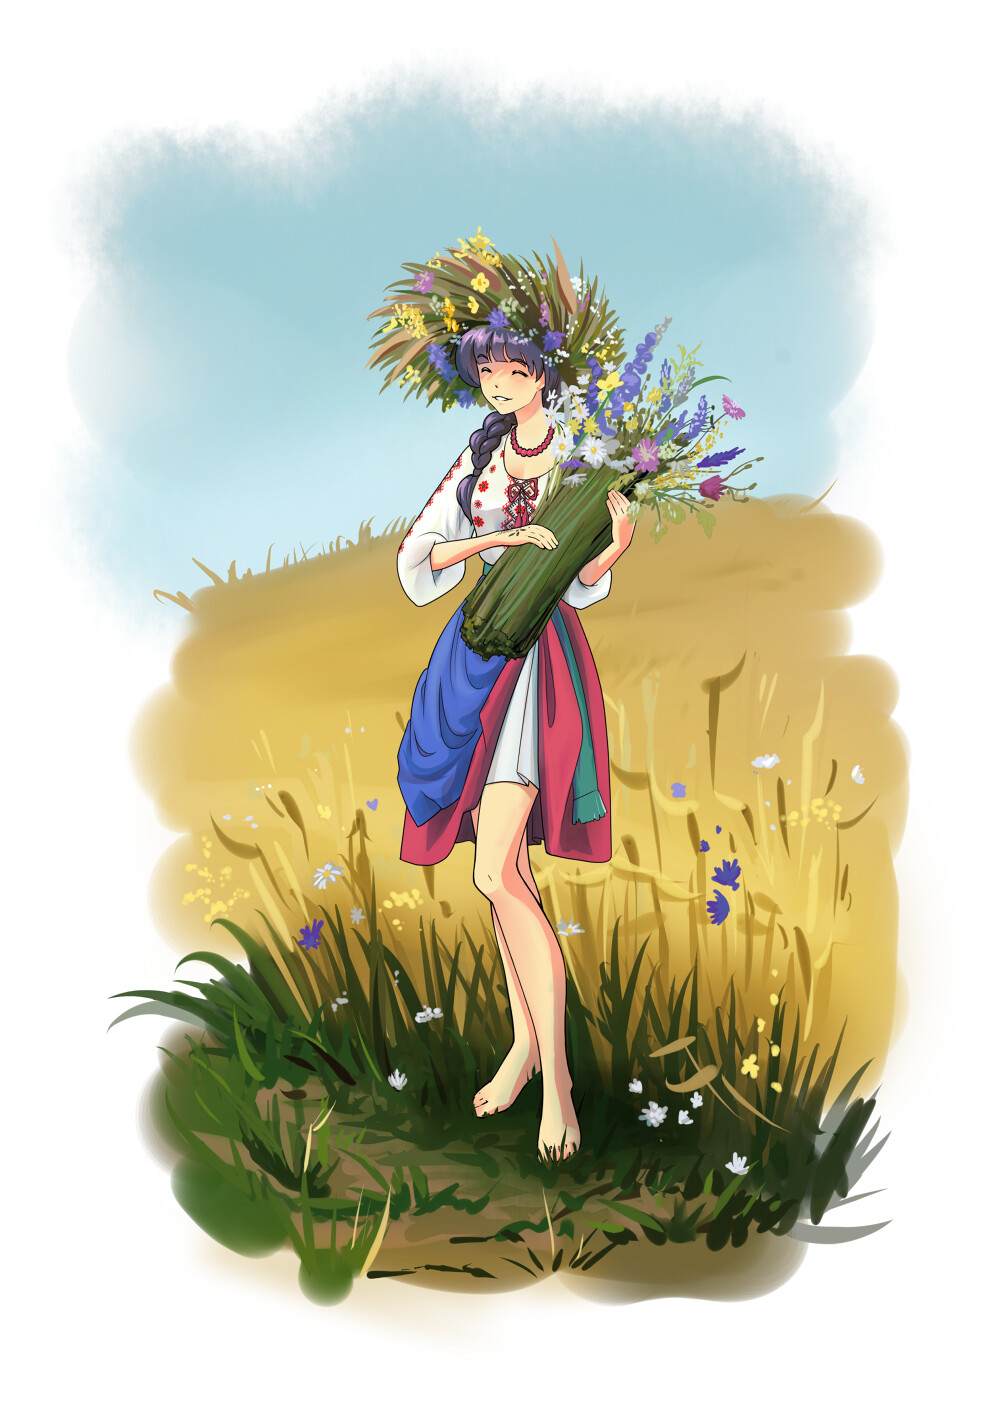 https://cdnb.artstation.com/p/assets/images/images/034/002/331/large/bimep-diana-peasant-clothes-3-1000.jpg?1611142622